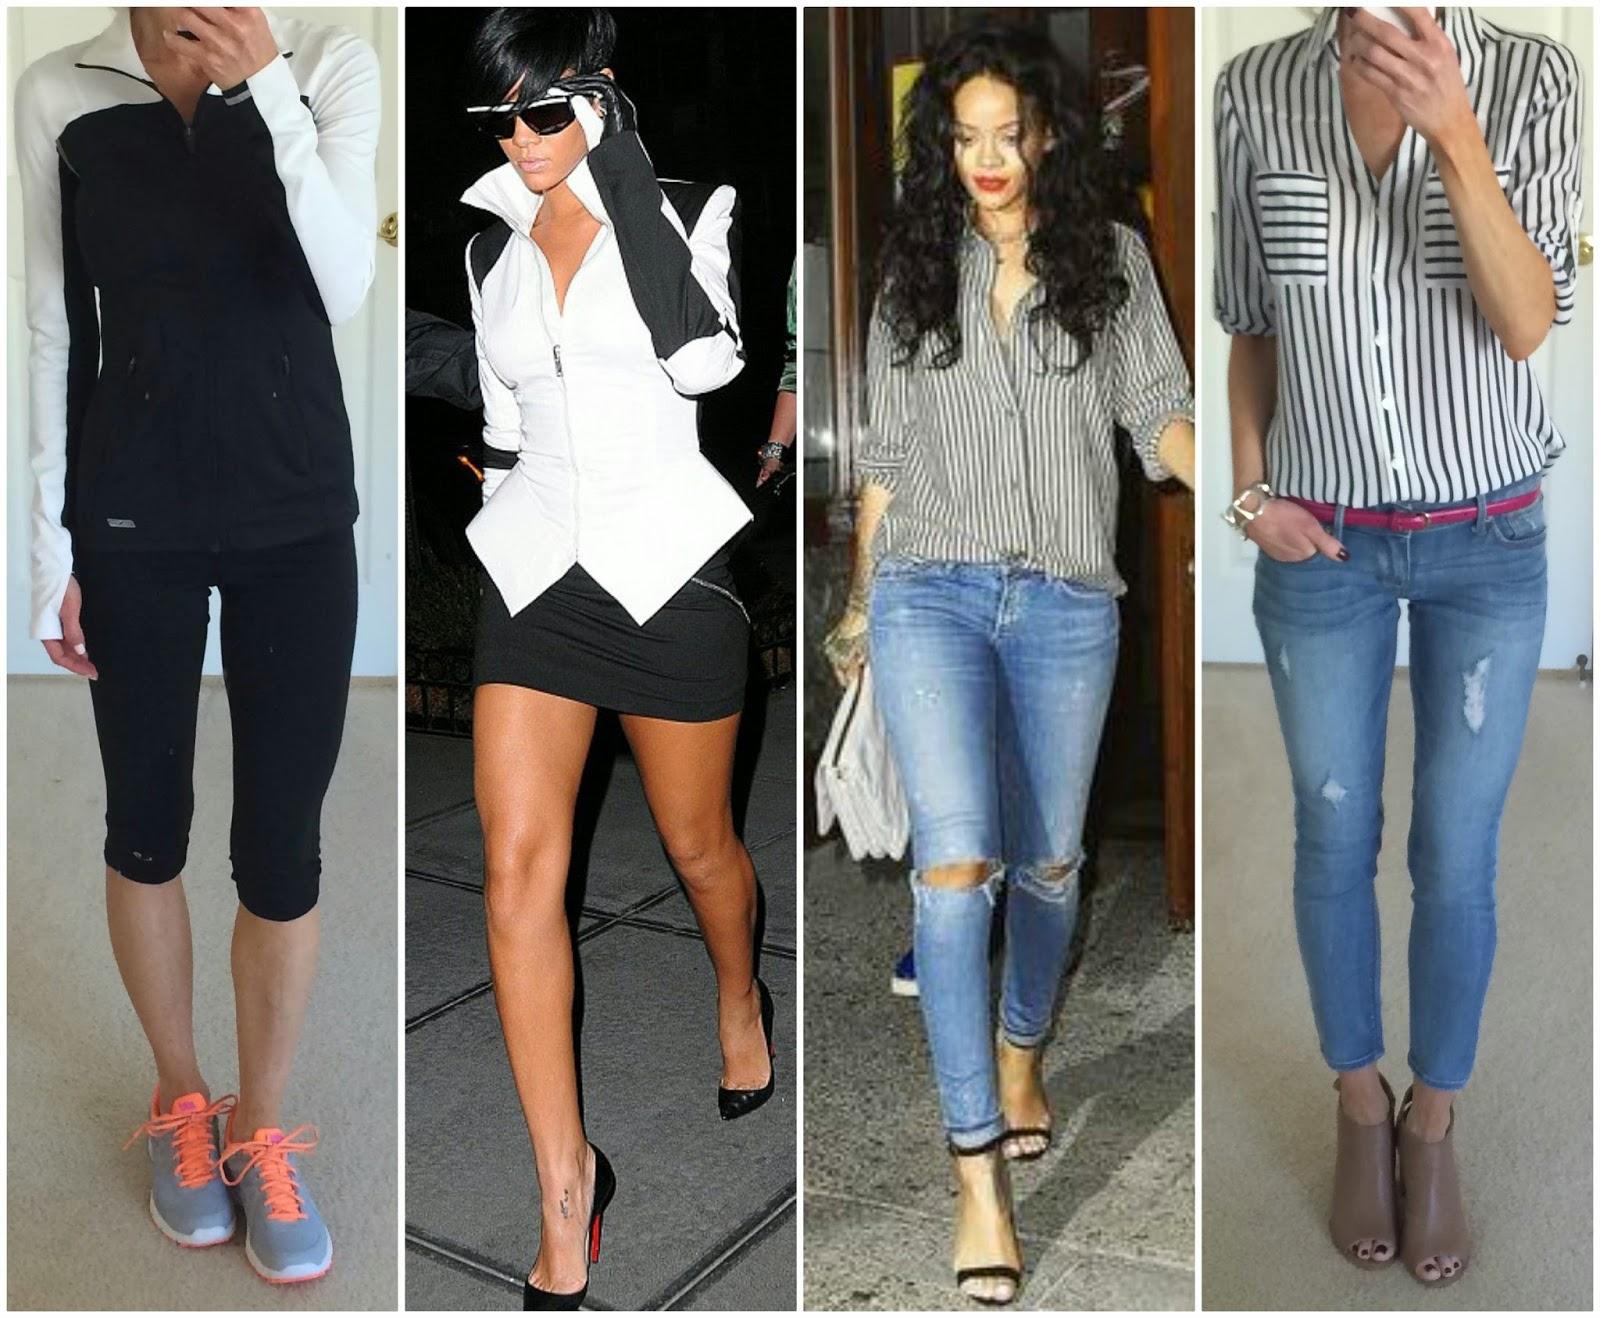 Rihanna Casual Outfits 2015